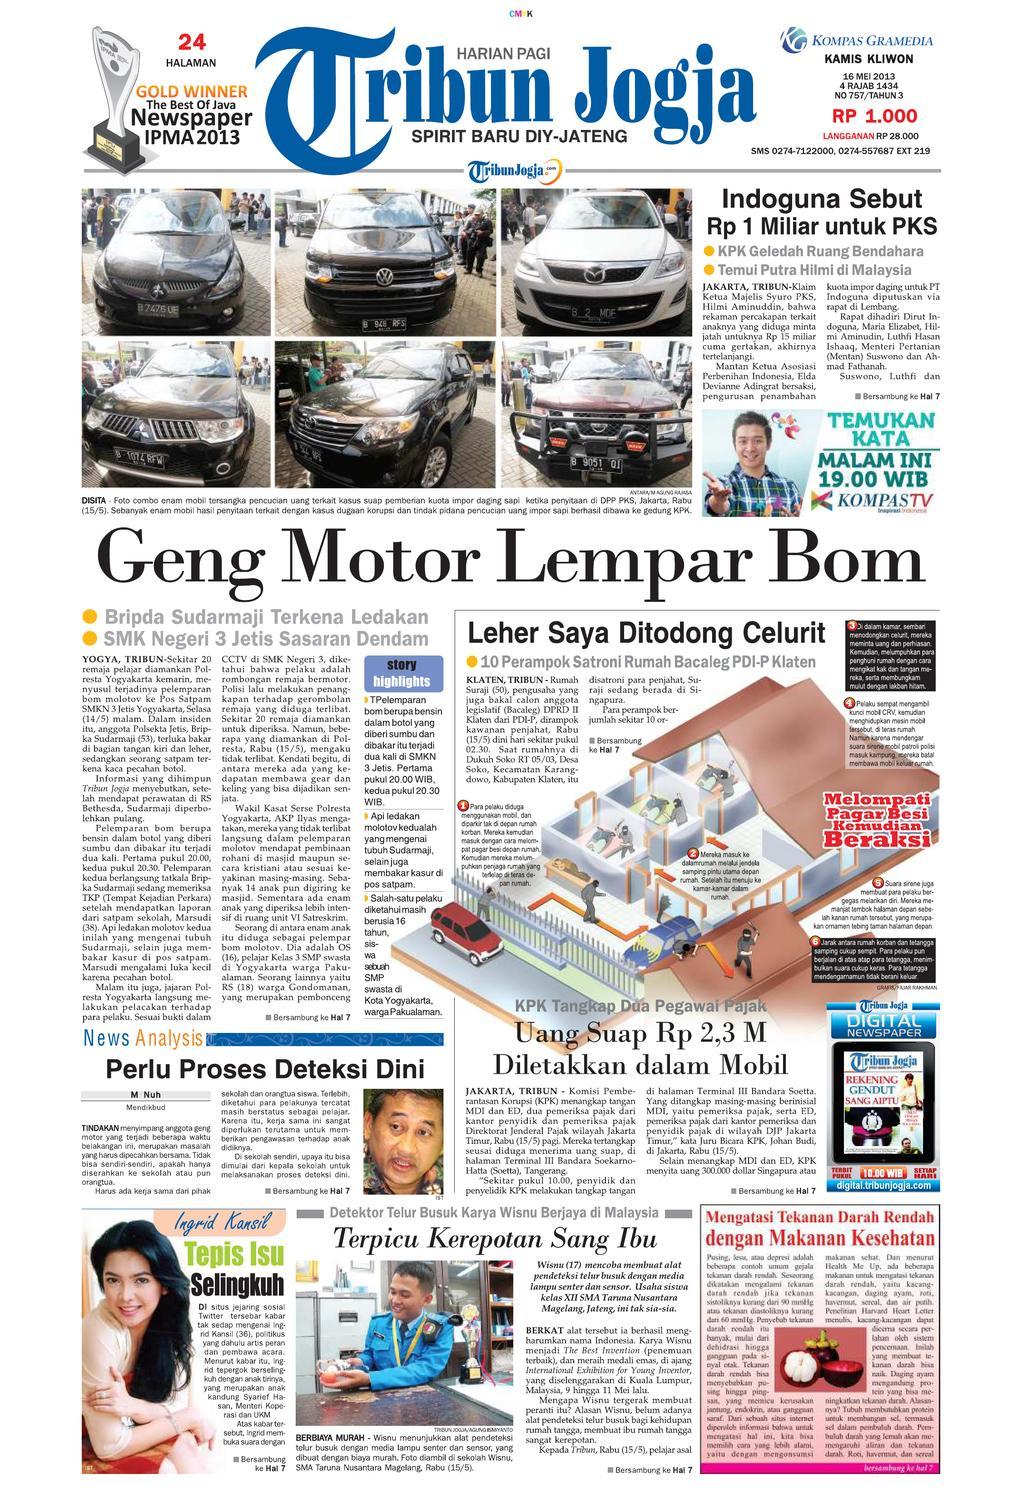 tribunjogja 16 05 2013 by tribun jogja issuu #2: page 1